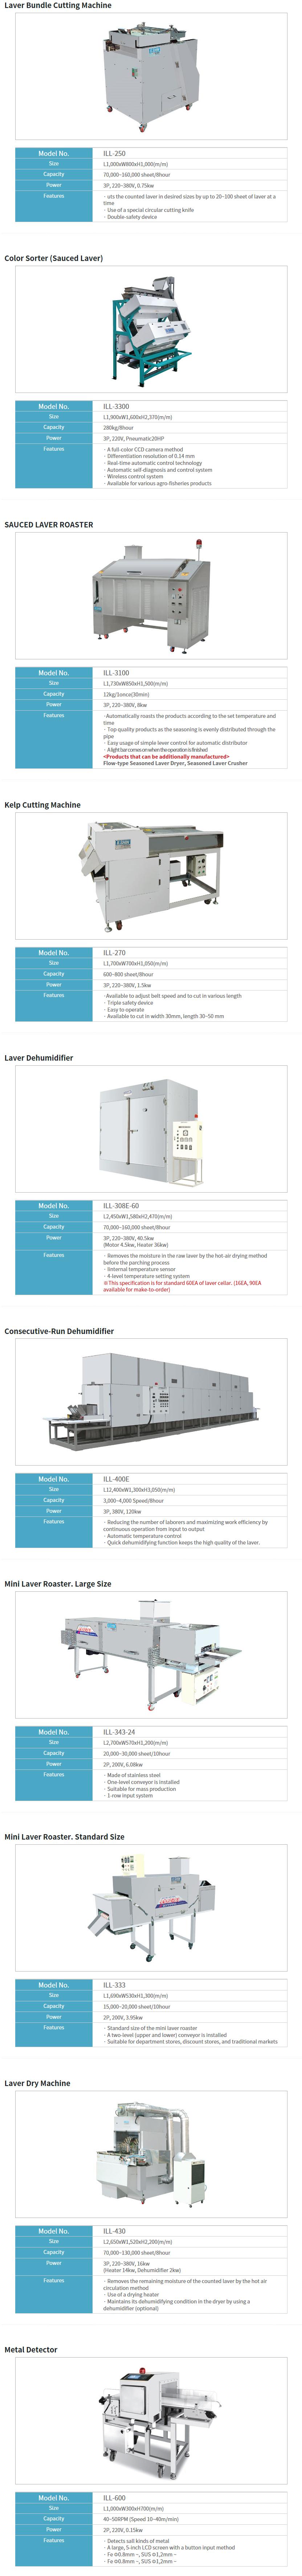 IL-SHIN MACHINE Other Machines  1